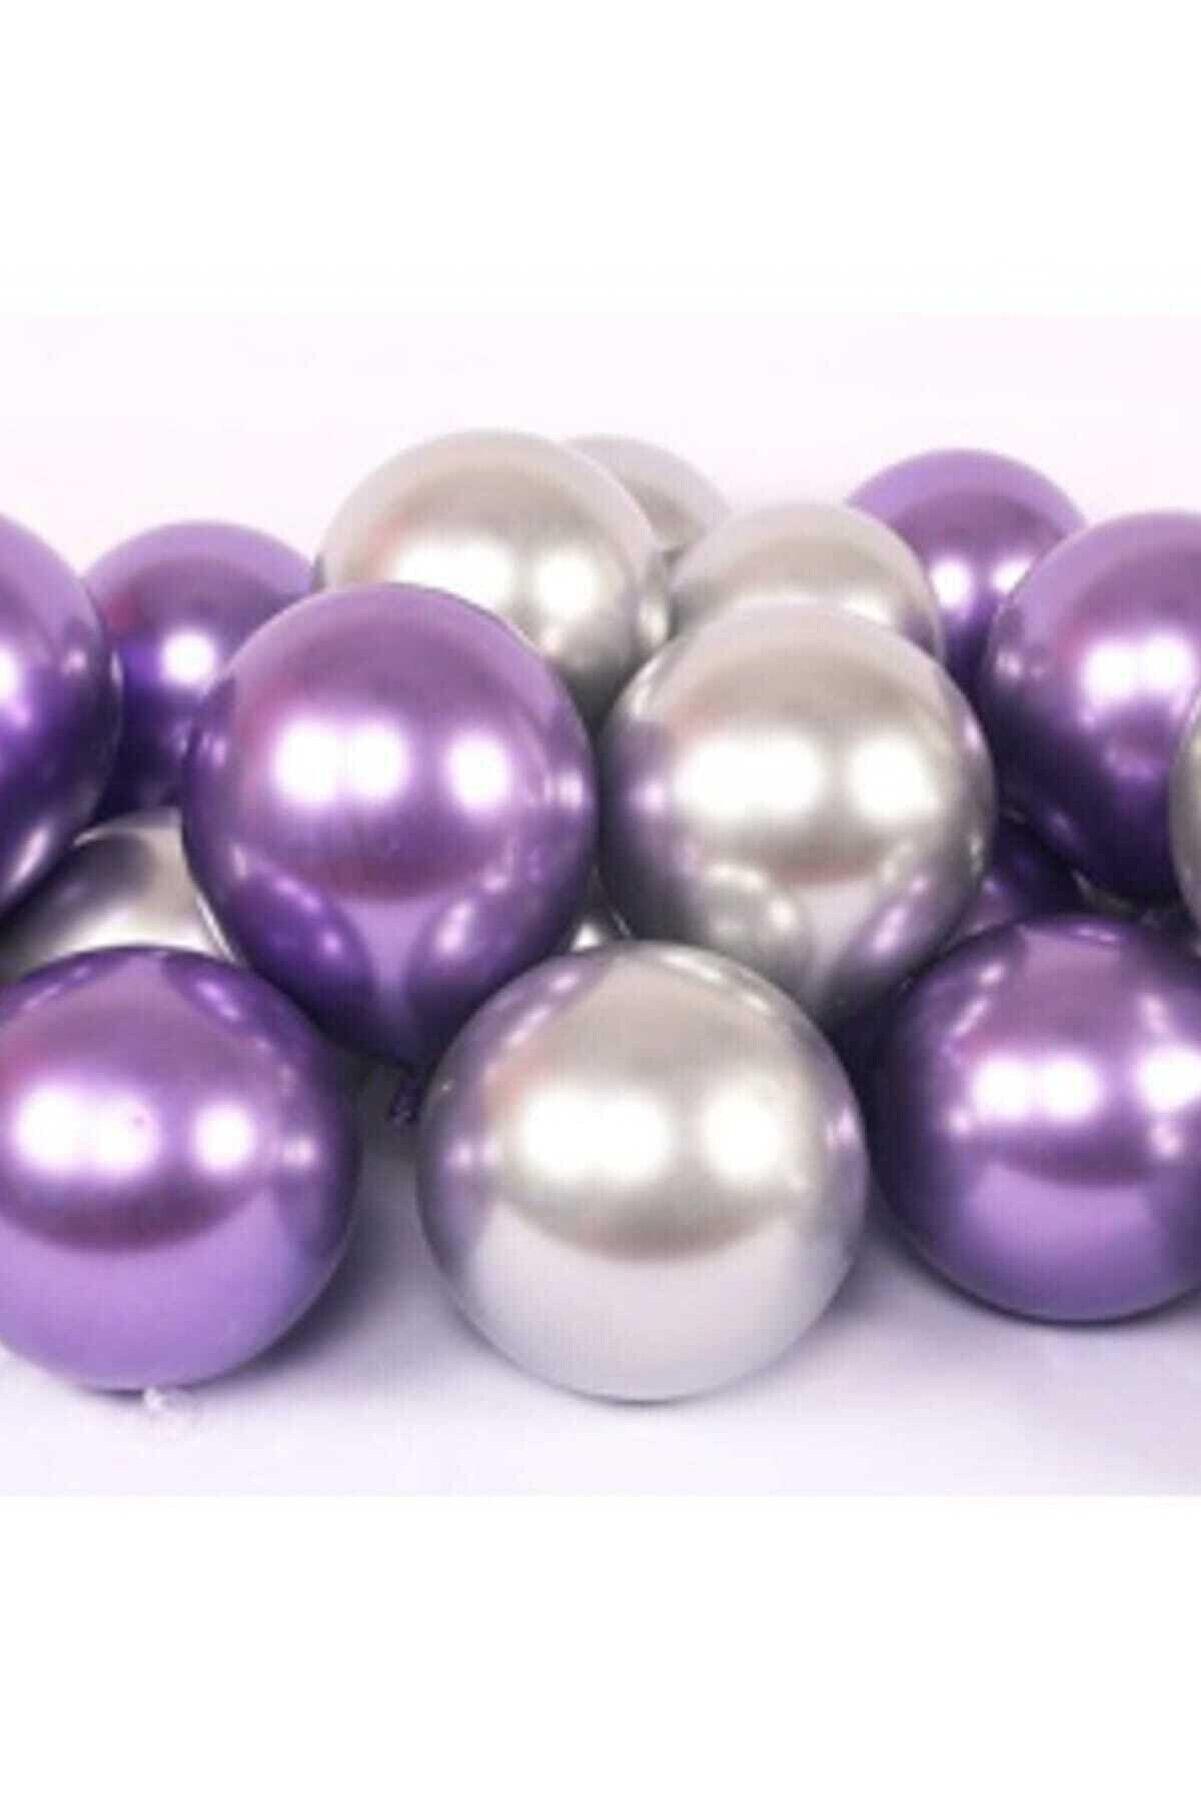 Magic Hobby Krom Parlak Metalik Mor-gümüş Renk 15'li Balon